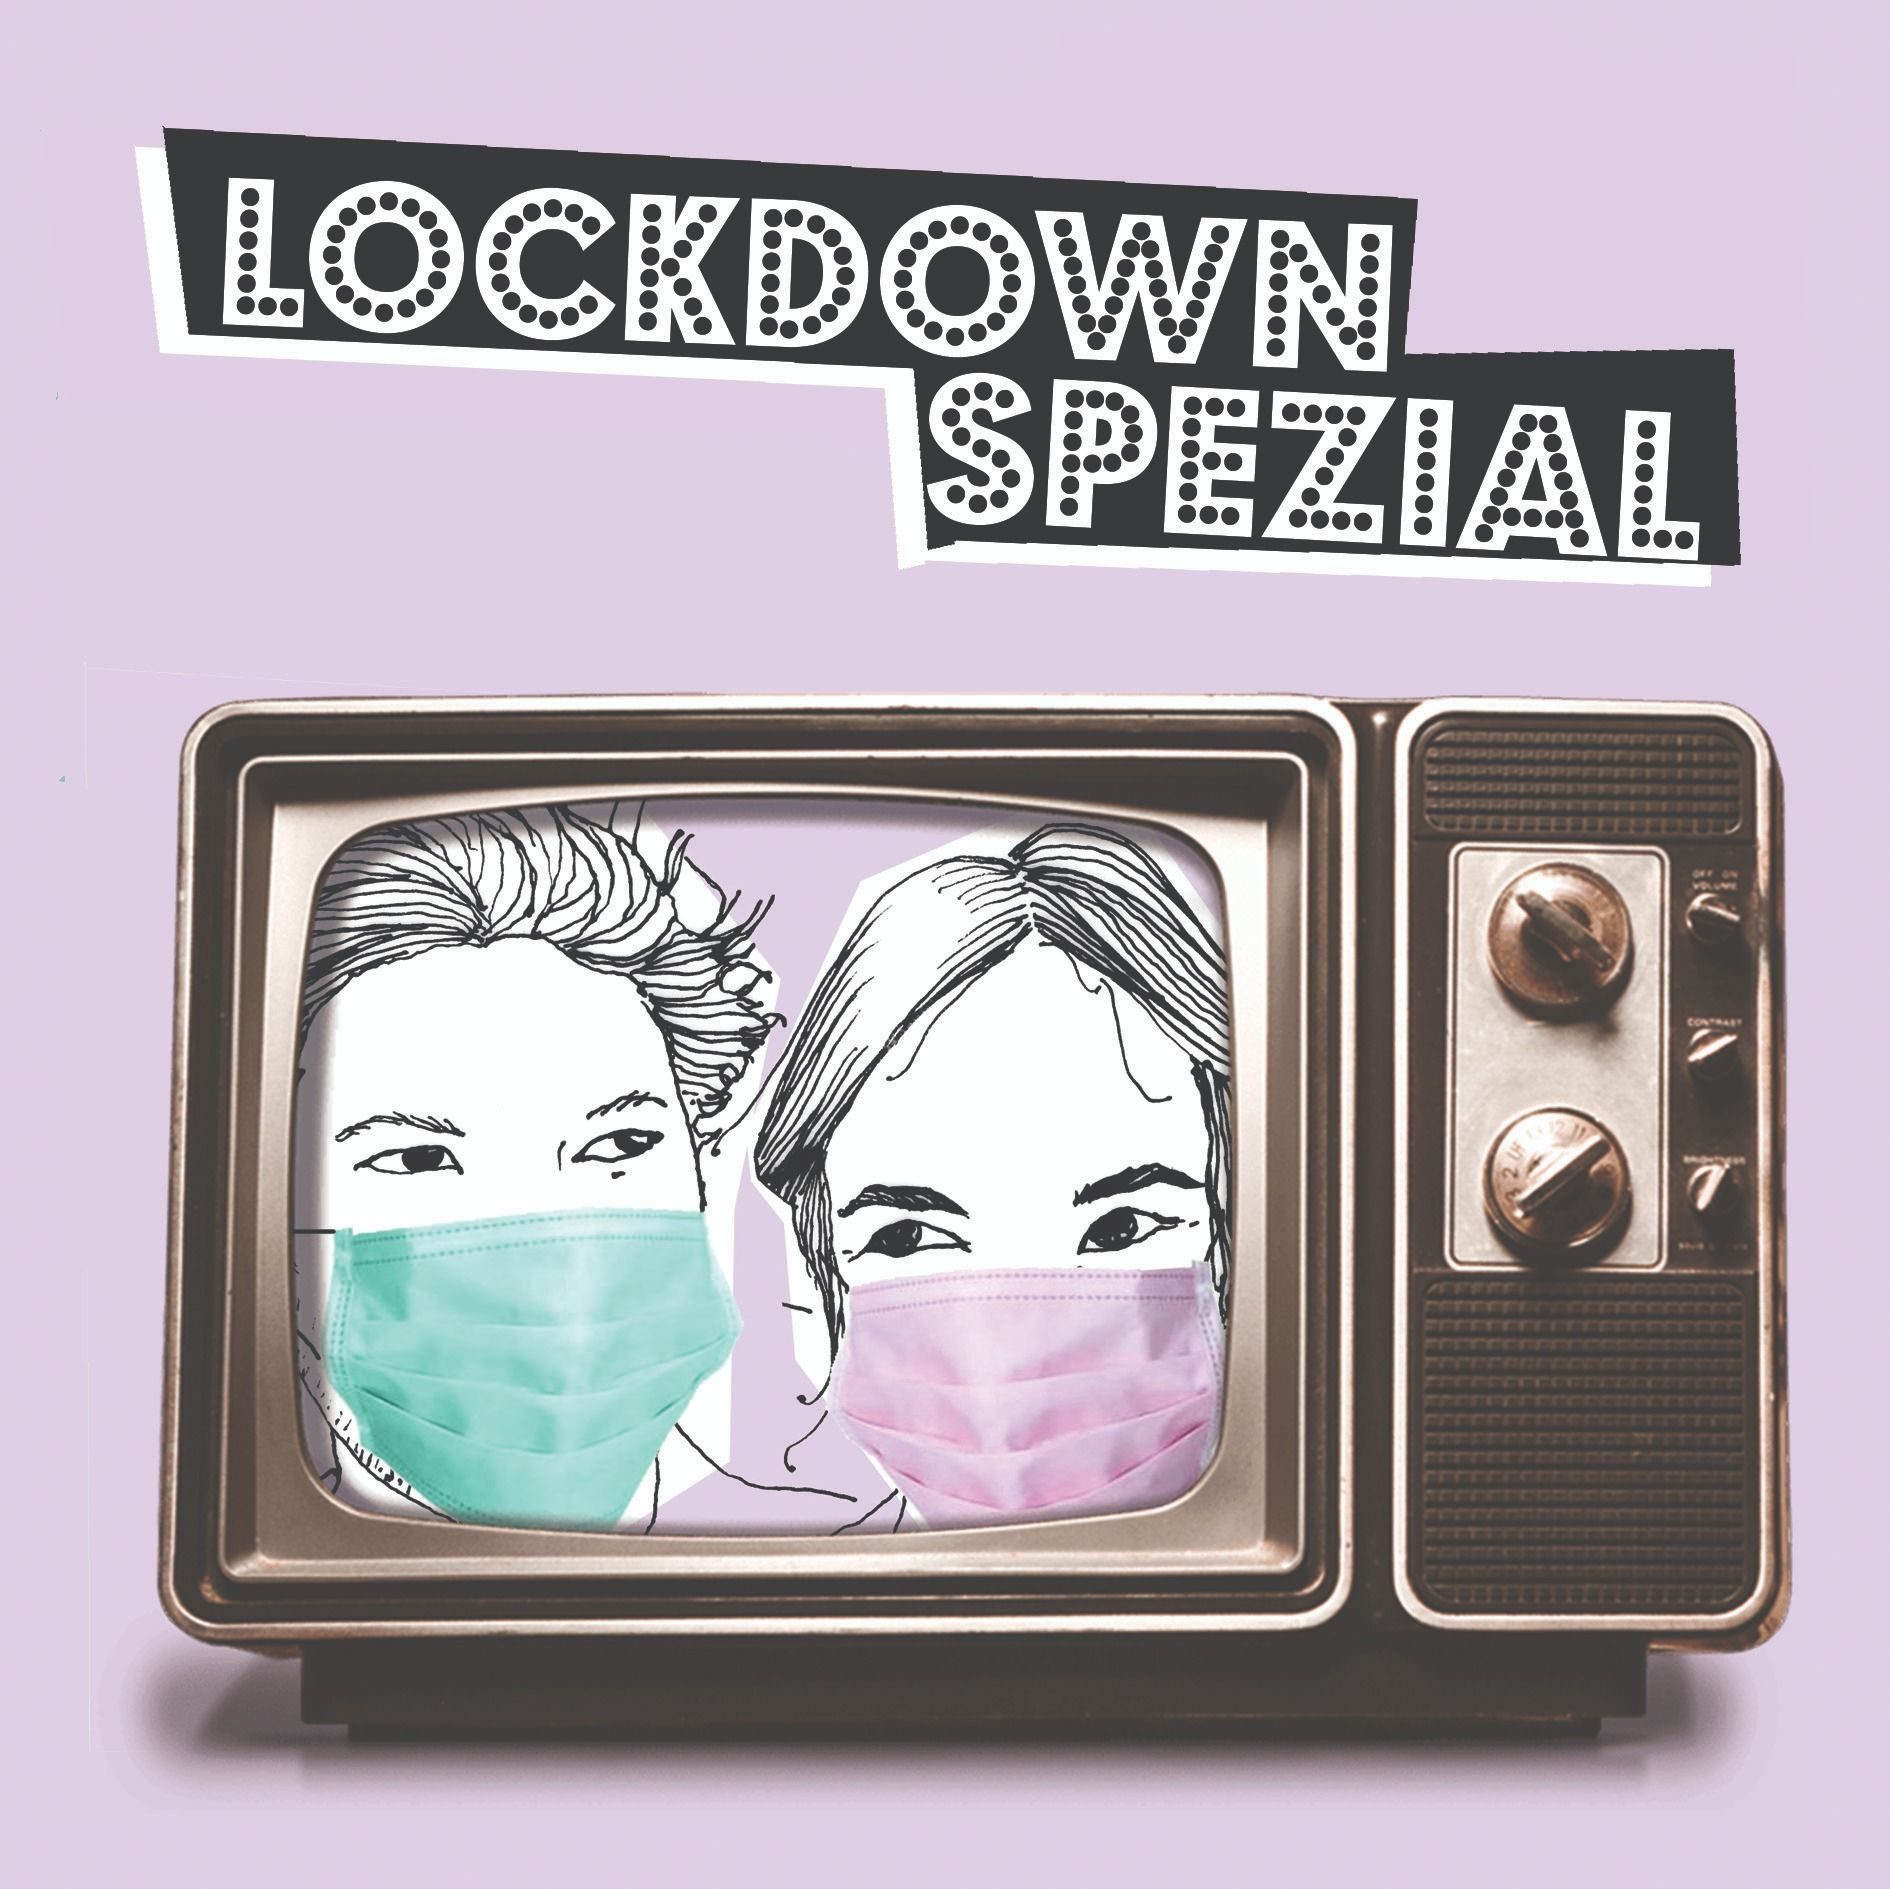 Lockdown Spezial